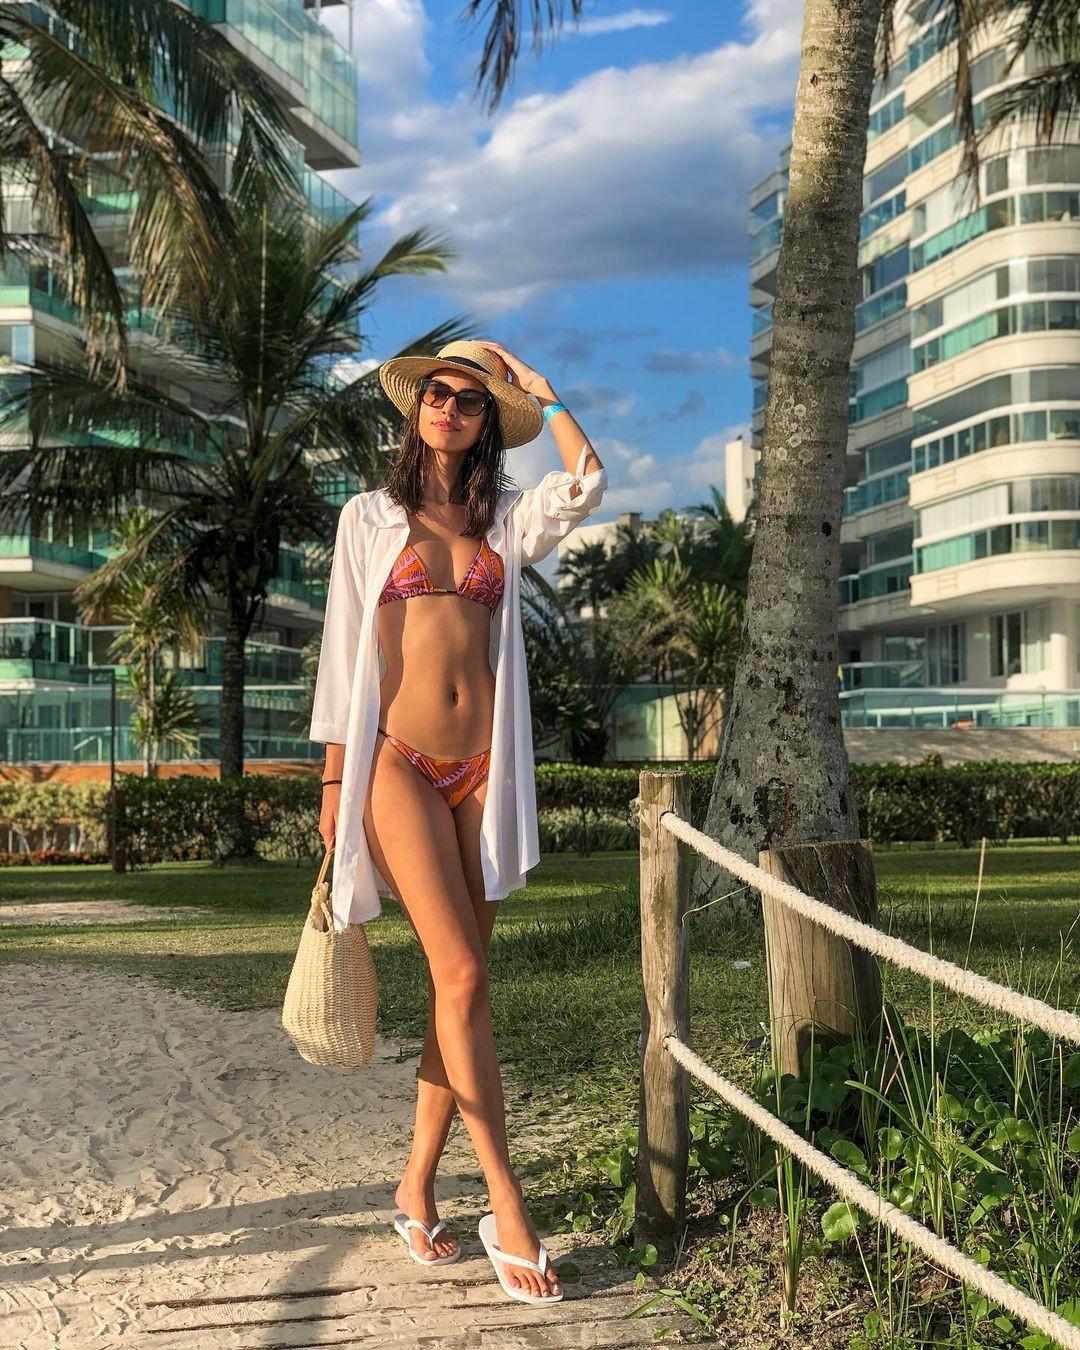 rafaella felipe, top 20 de miss brasil mundo 2019. - Página 2 Qlqj3b10